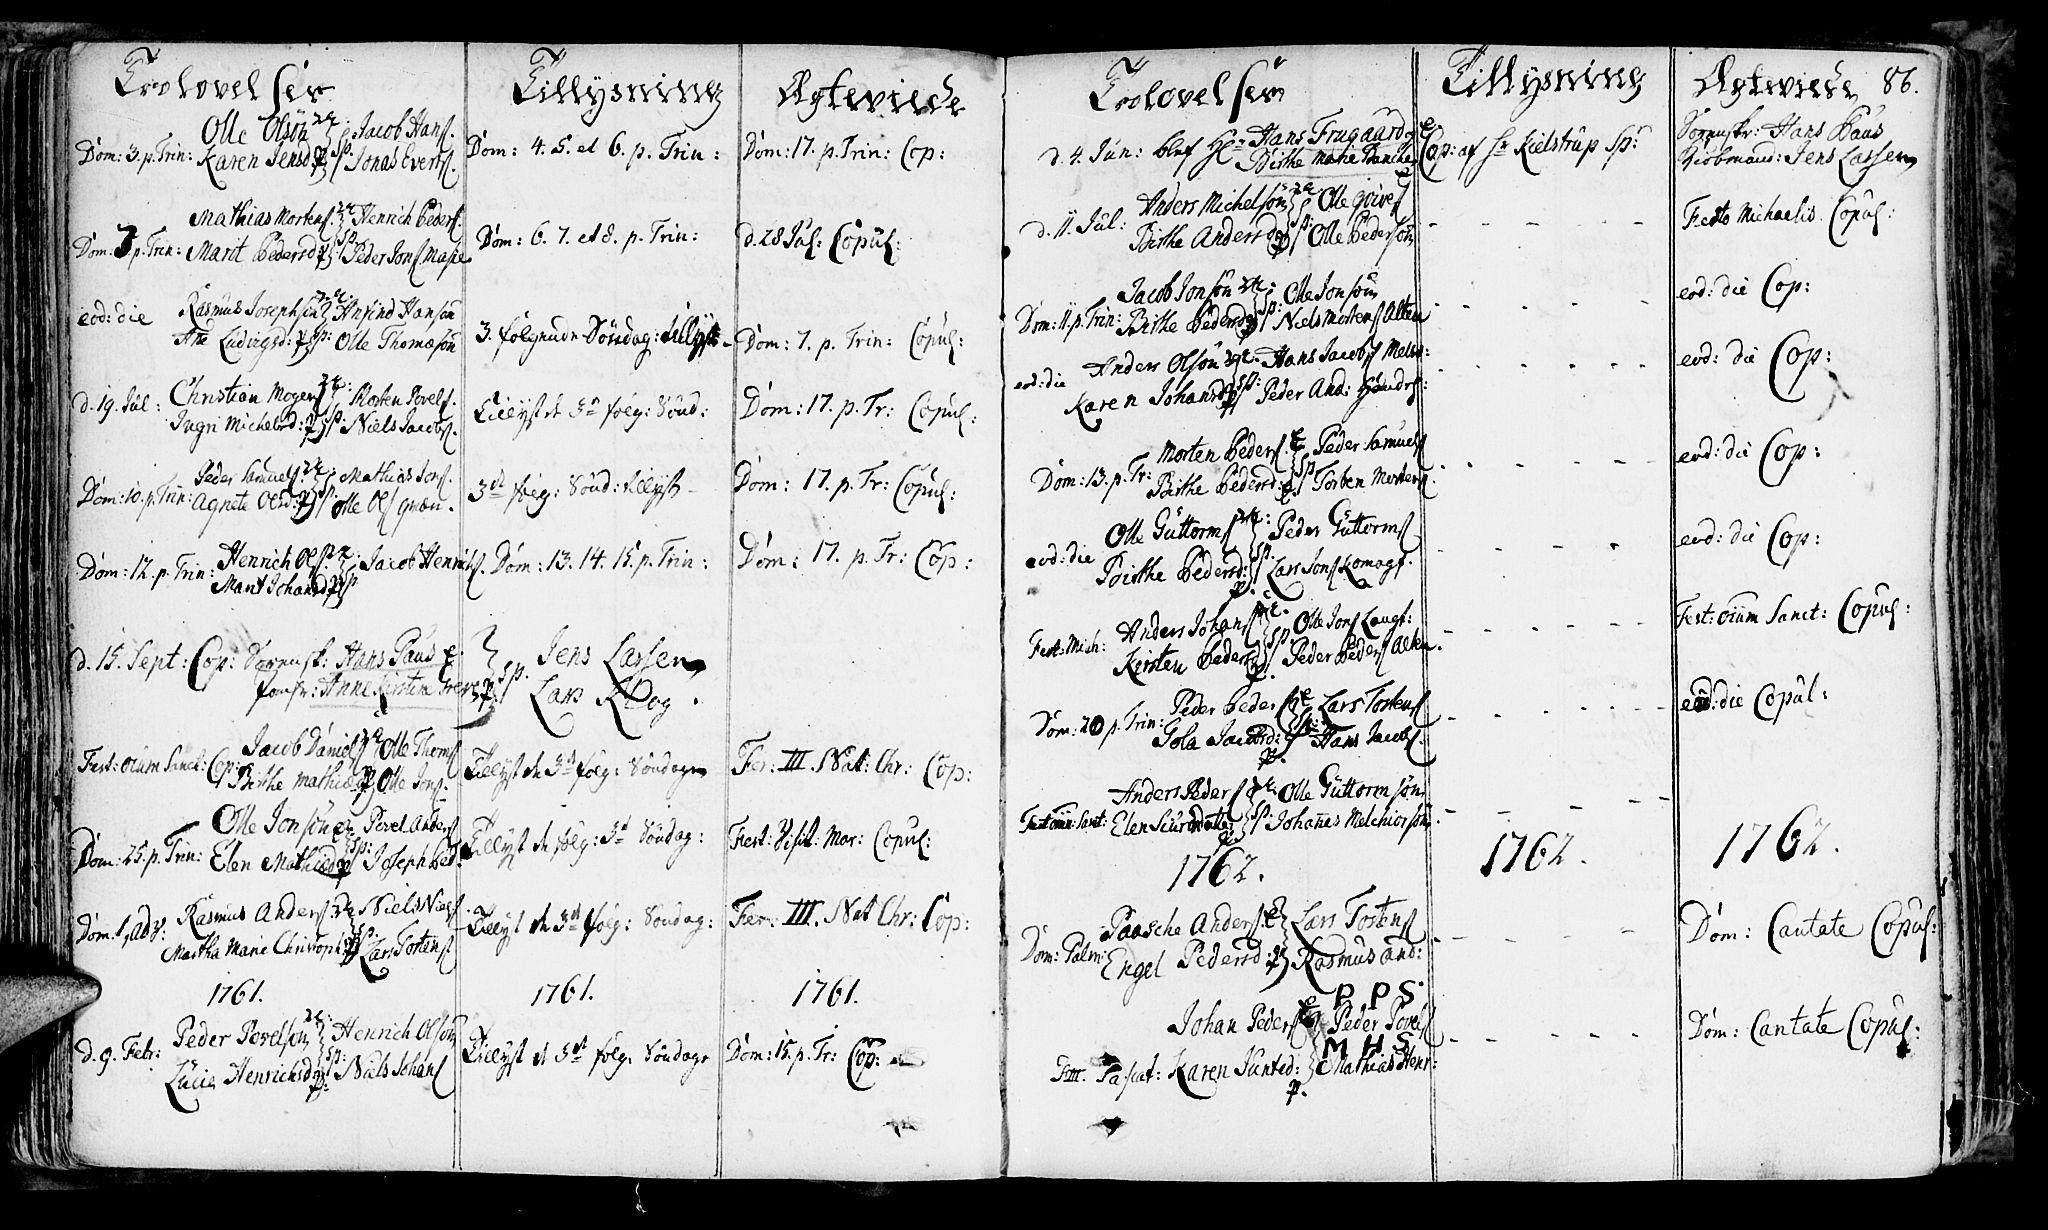 SATØ, Talvik sokneprestkontor, H/Ha/L0004kirke: Ministerialbok nr. 4, 1752-1772, s. 86